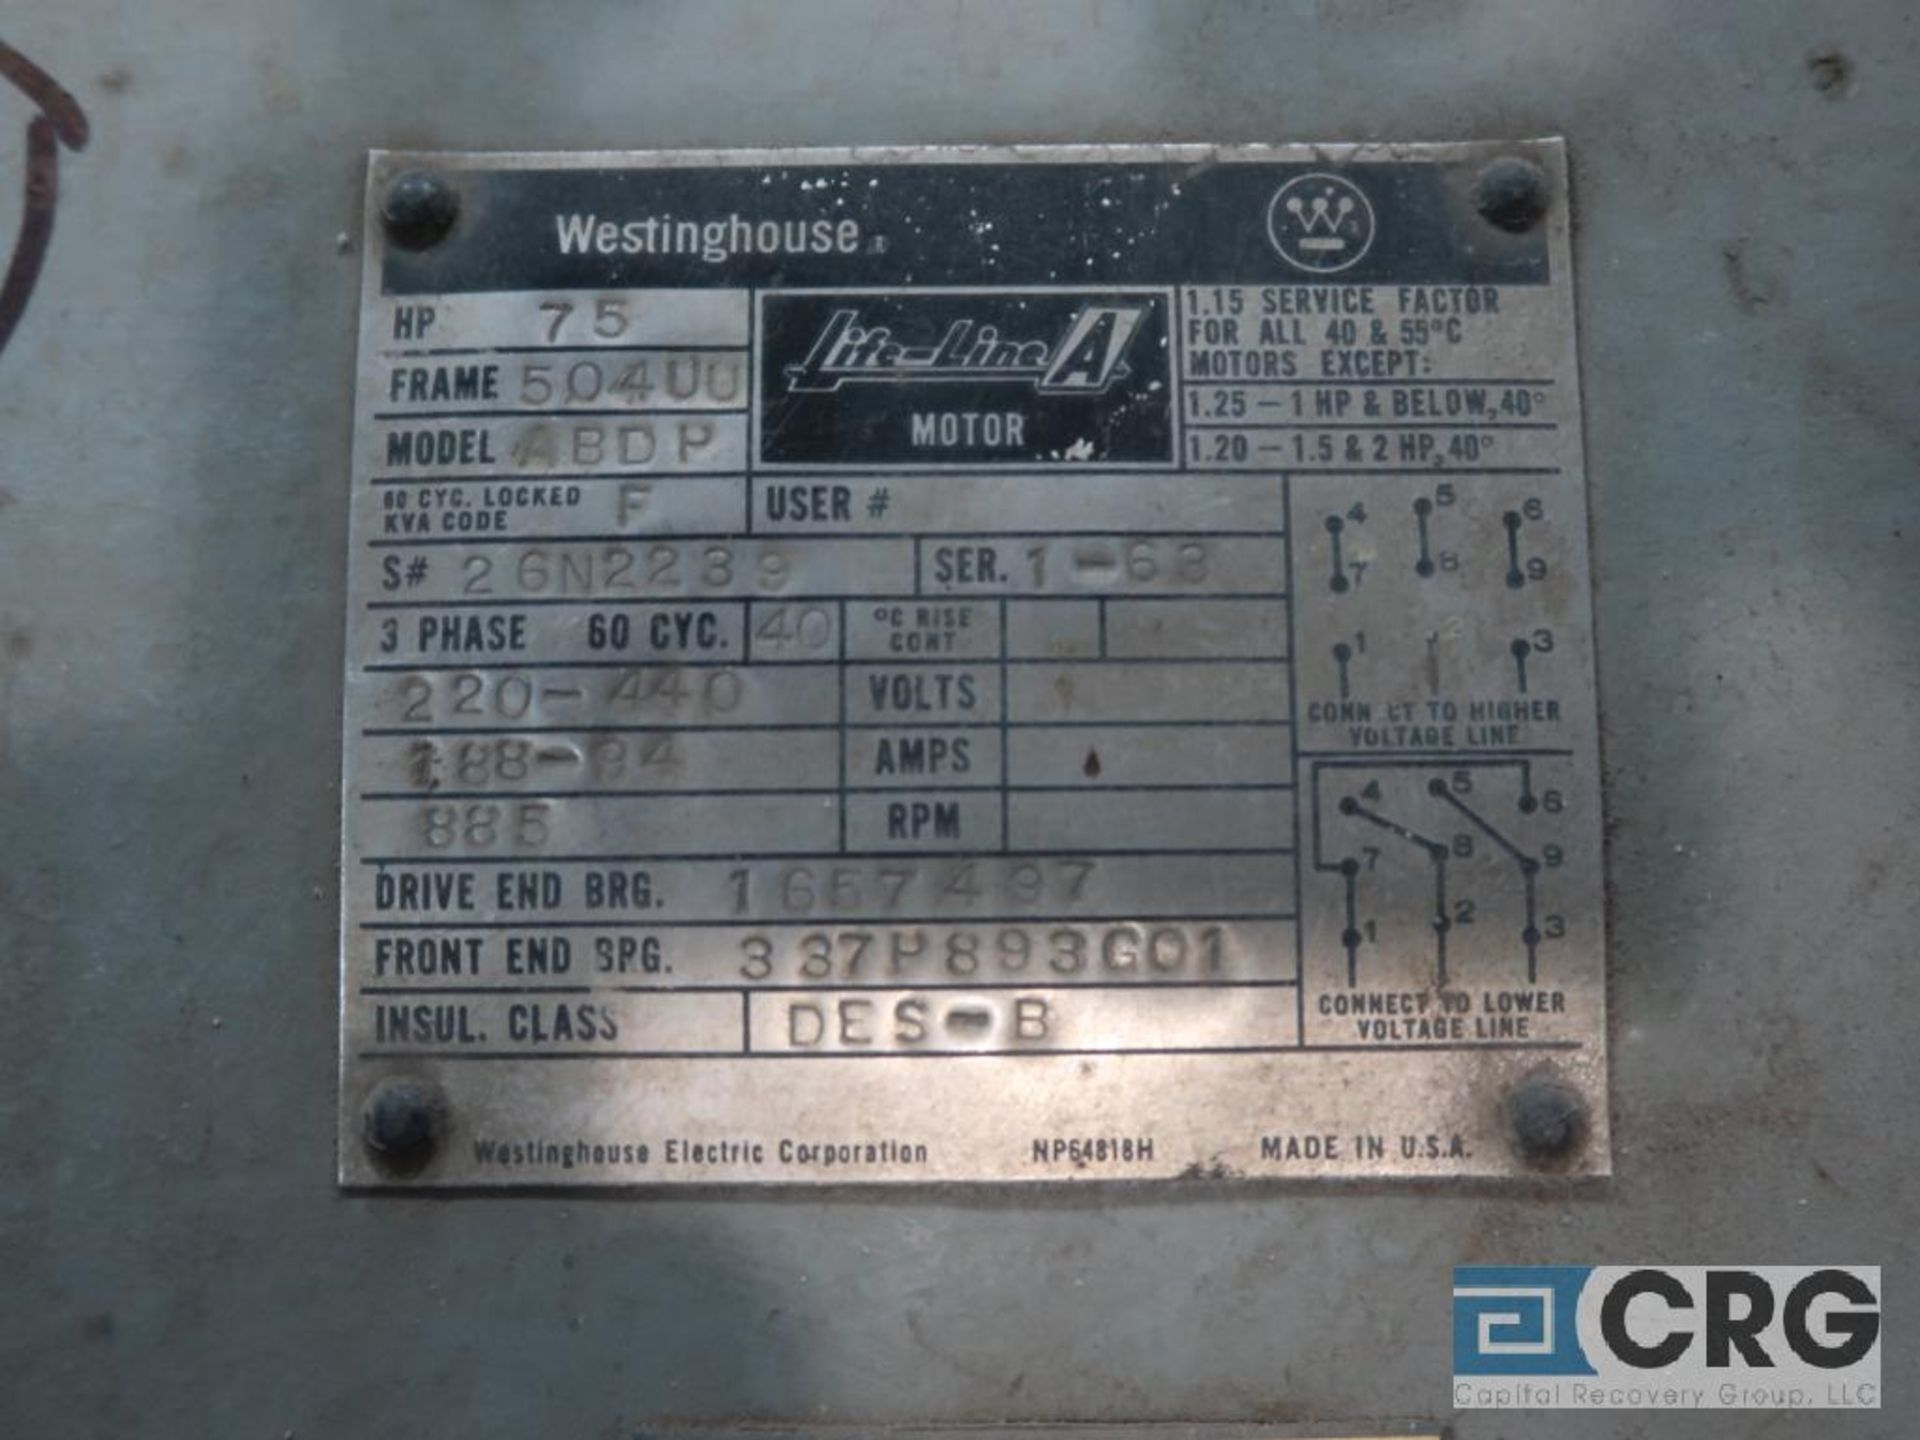 Westinghouse Life-Line A motor, 75 HP, 885 RPMs, 220/440 volt, 3 ph., 504UU frame (Finish Building) - Image 2 of 2